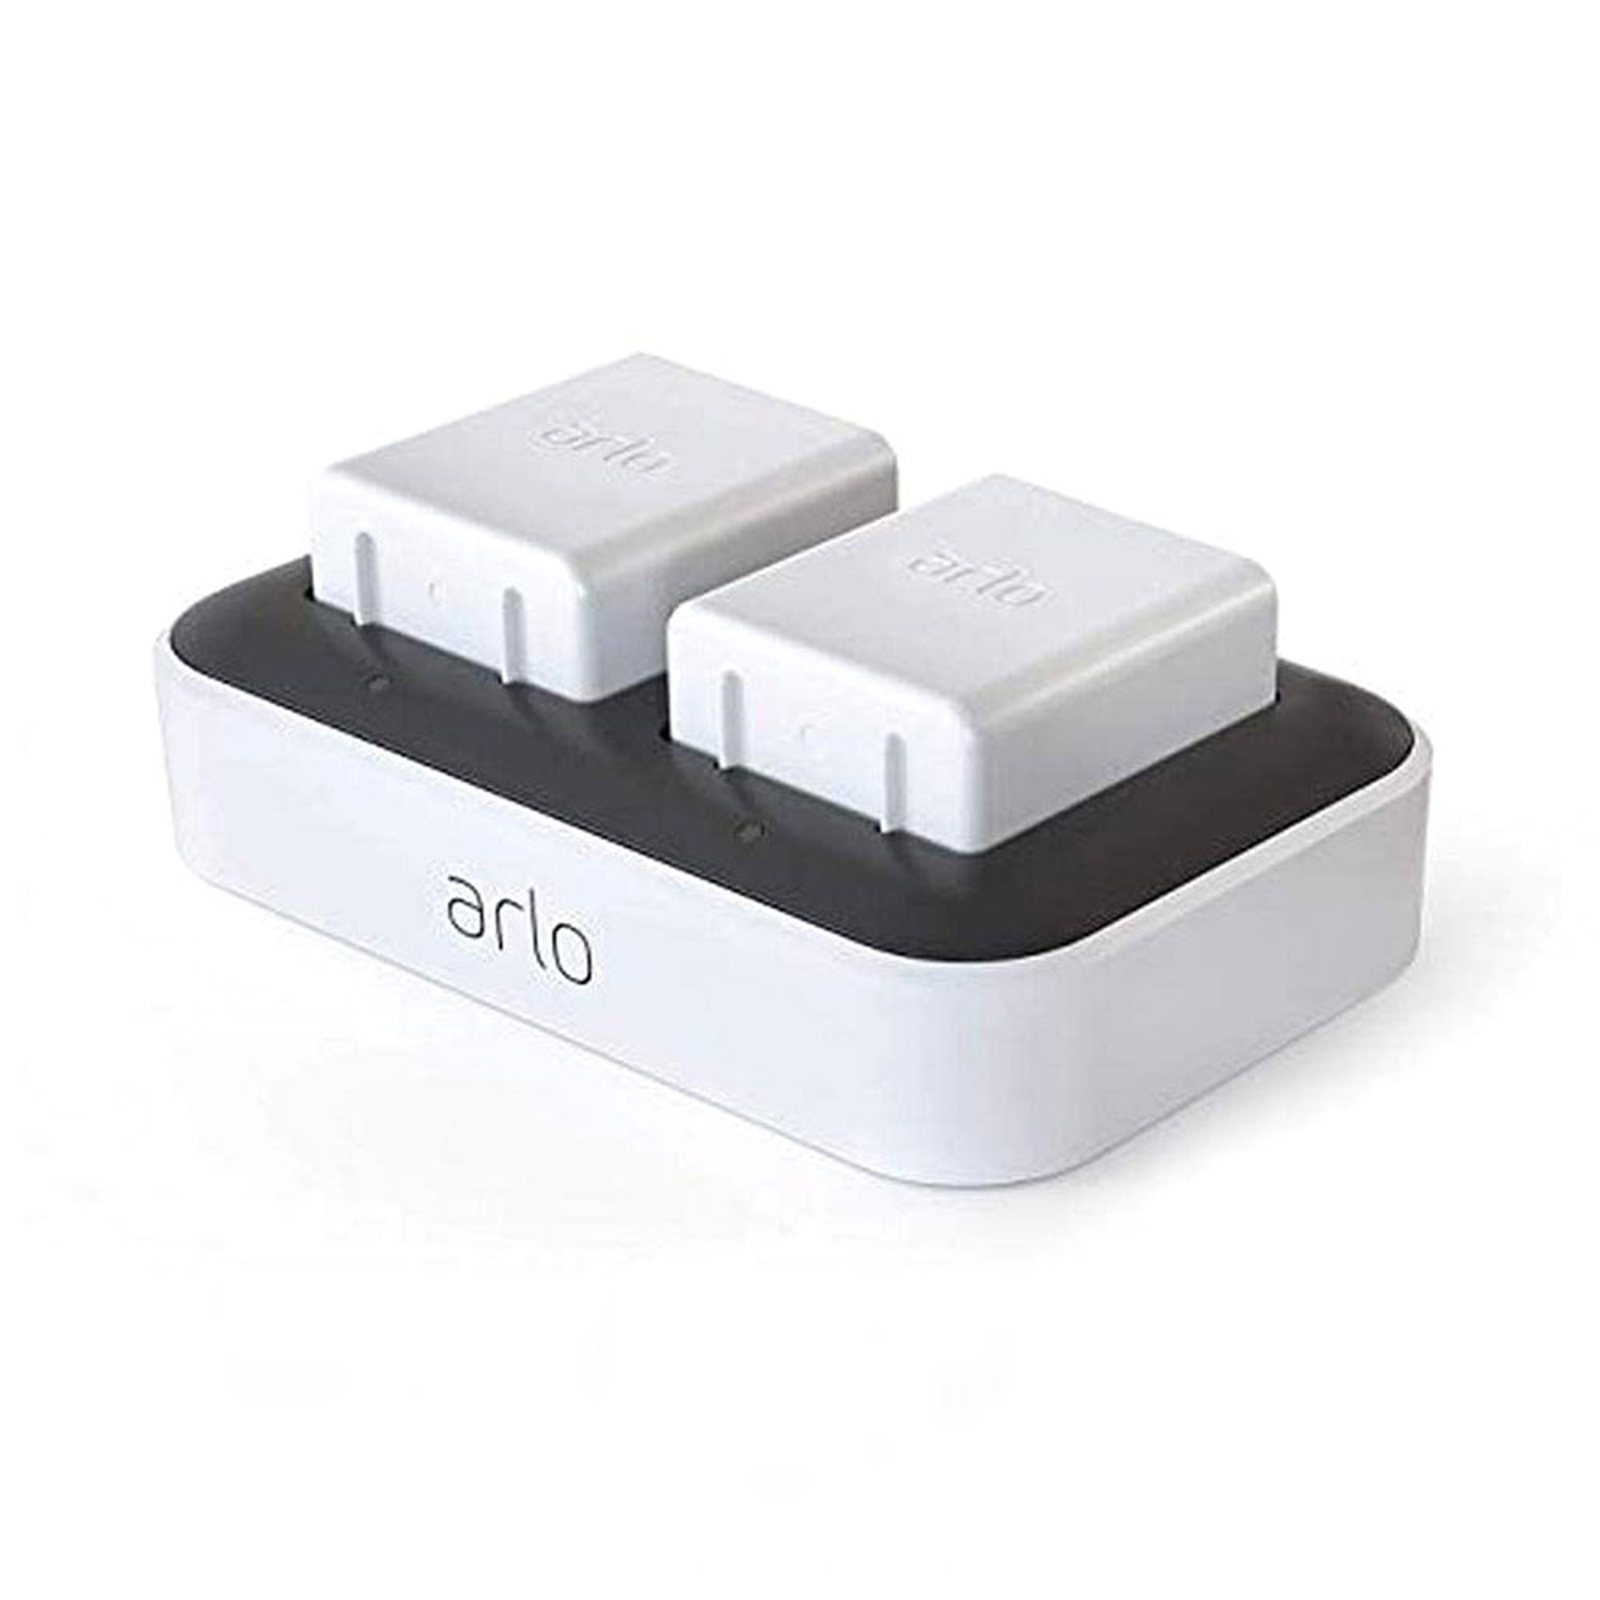 Arlo Doppel-Ladestation für Kamera Ultra, Pro3, FL